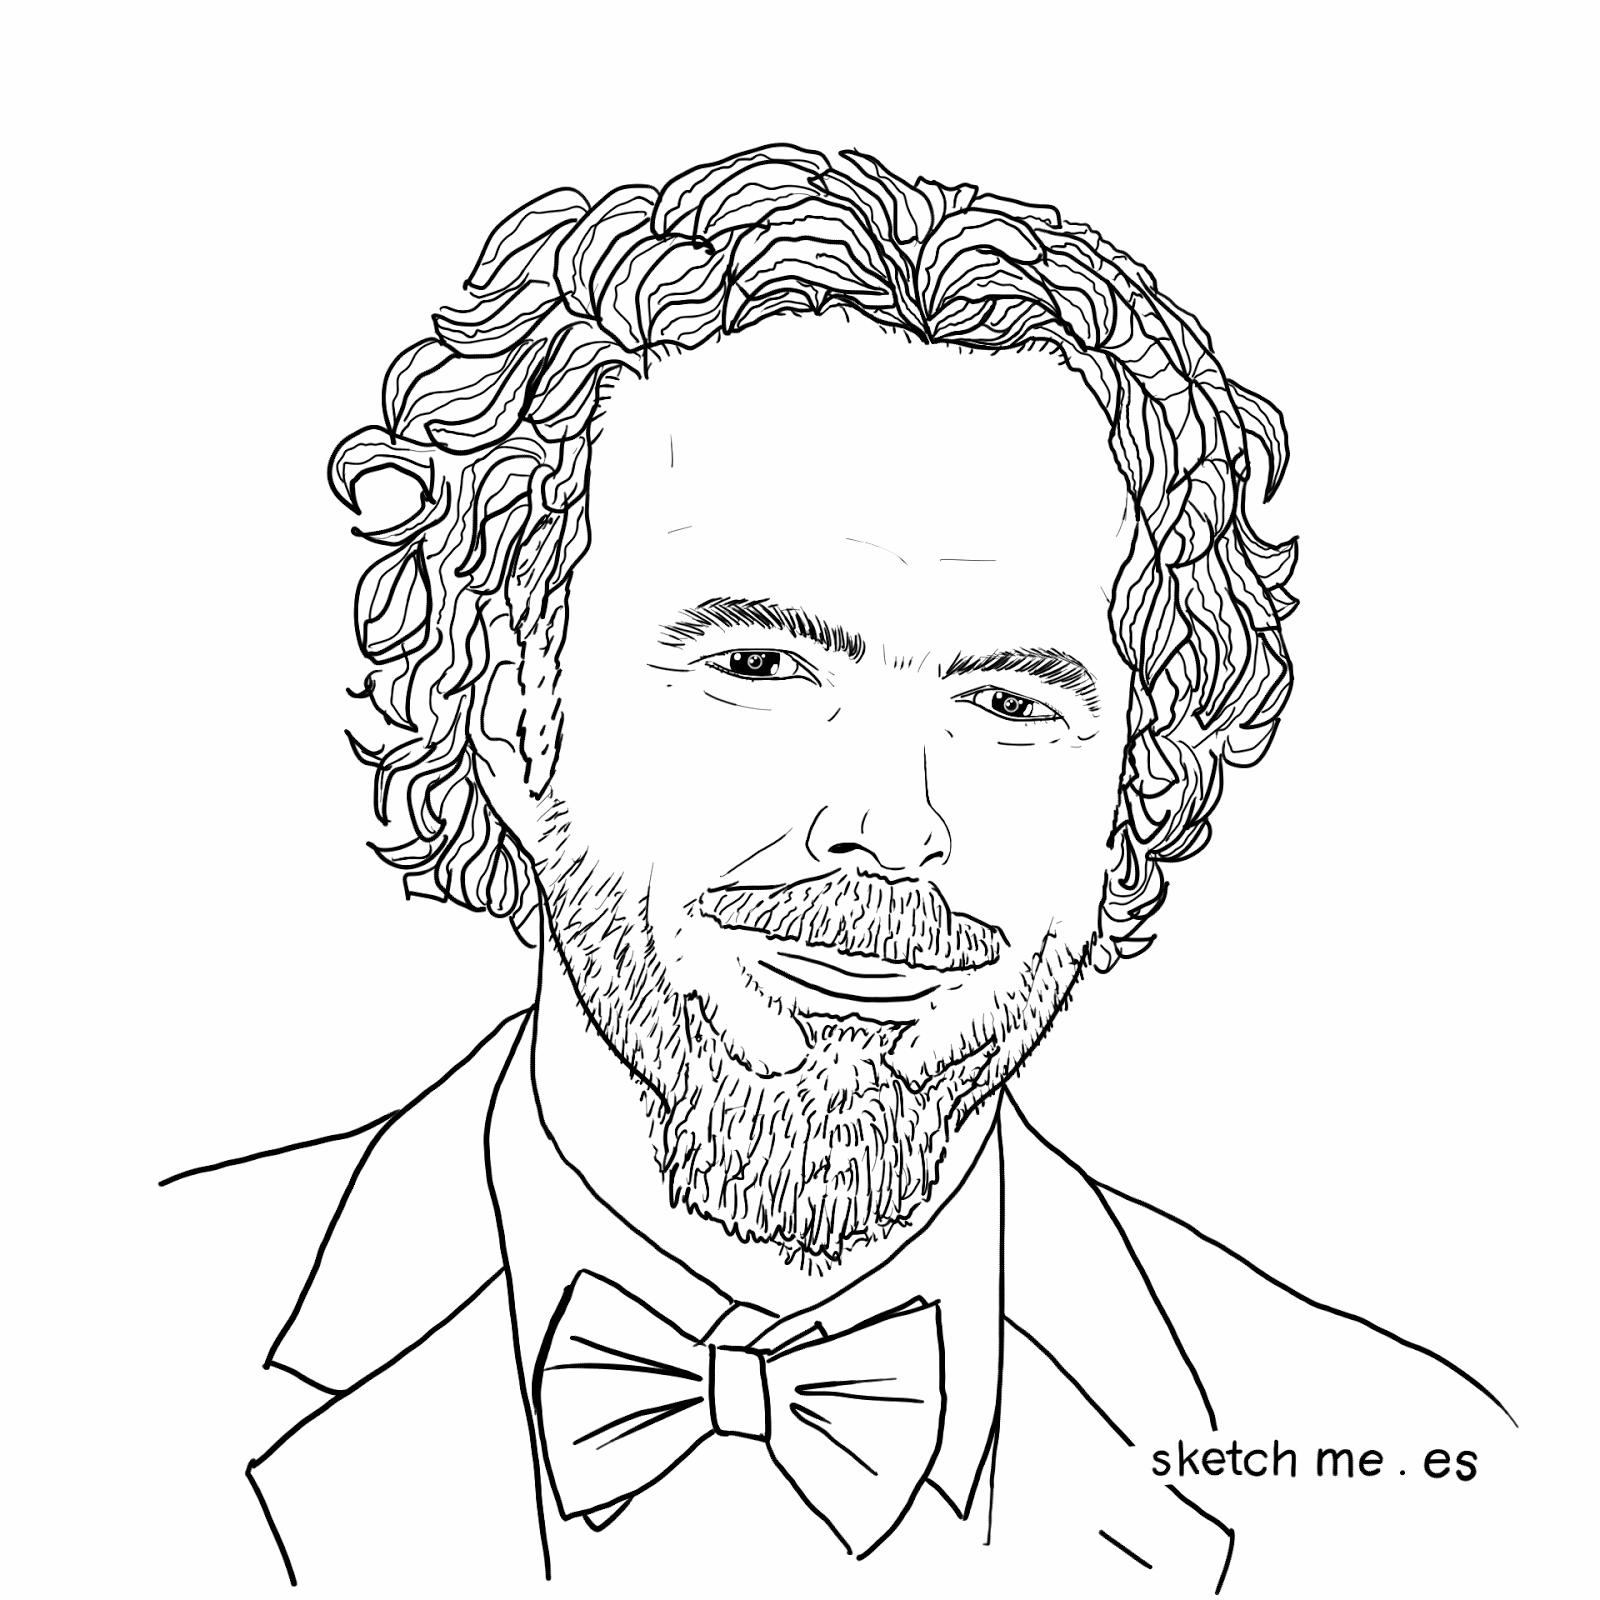 custtom-portraits-retratos-personalizados-facebook-jerry-alejandro-gonzalez-iñarritu